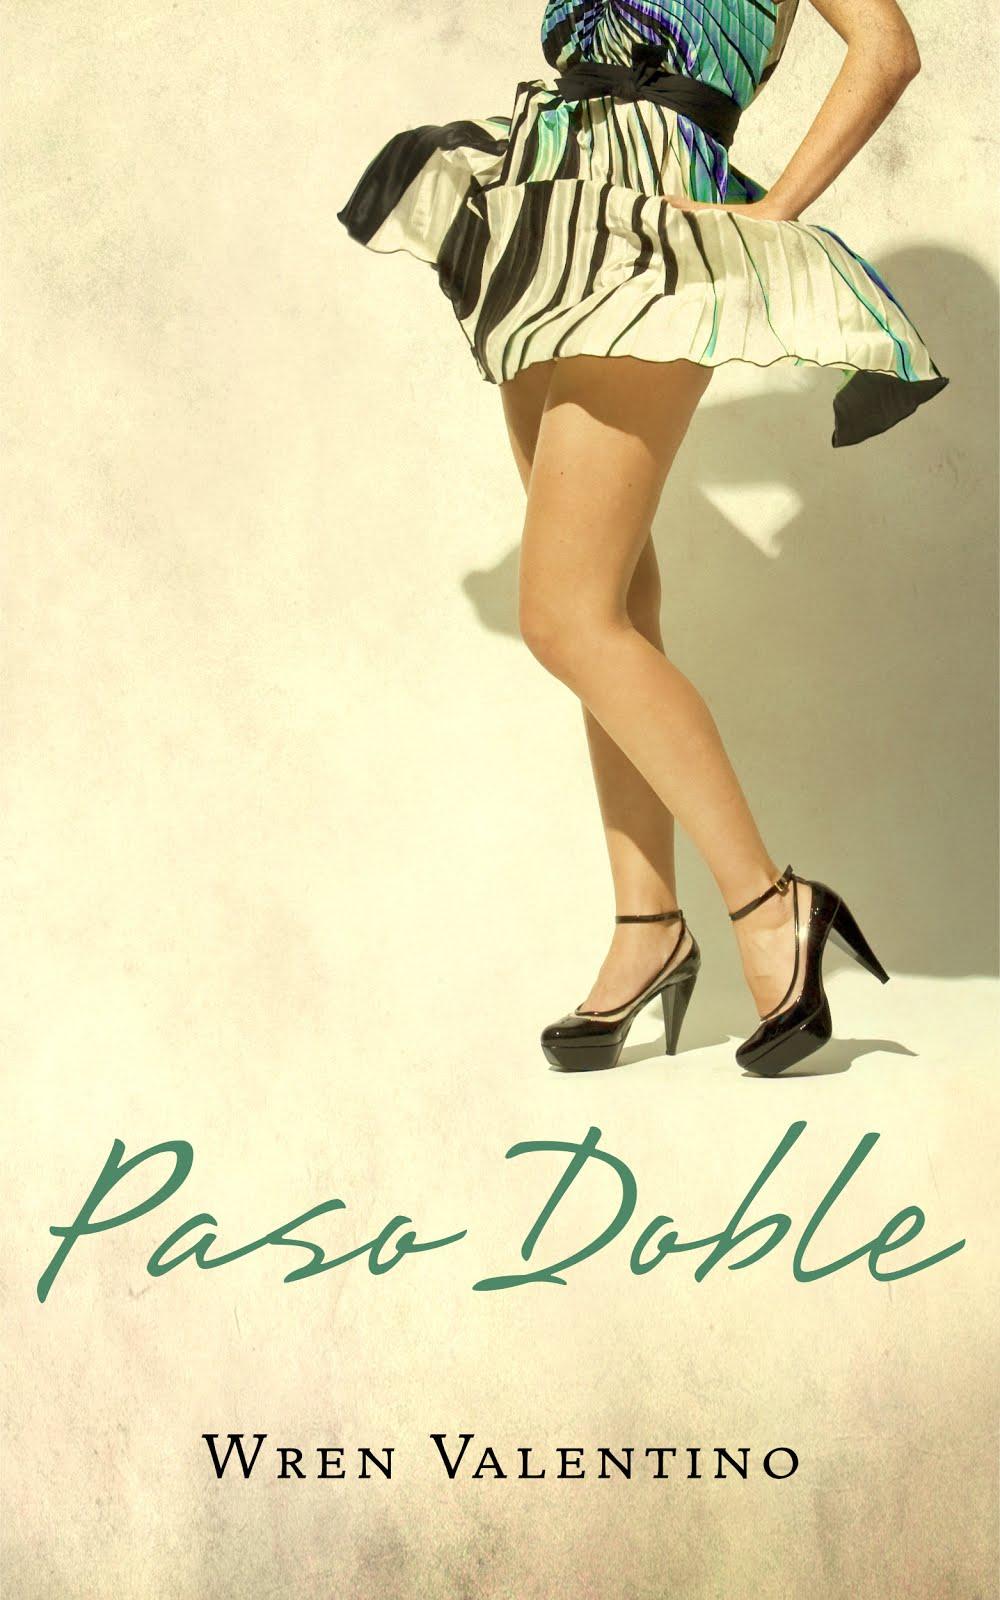 PASO DOBLE